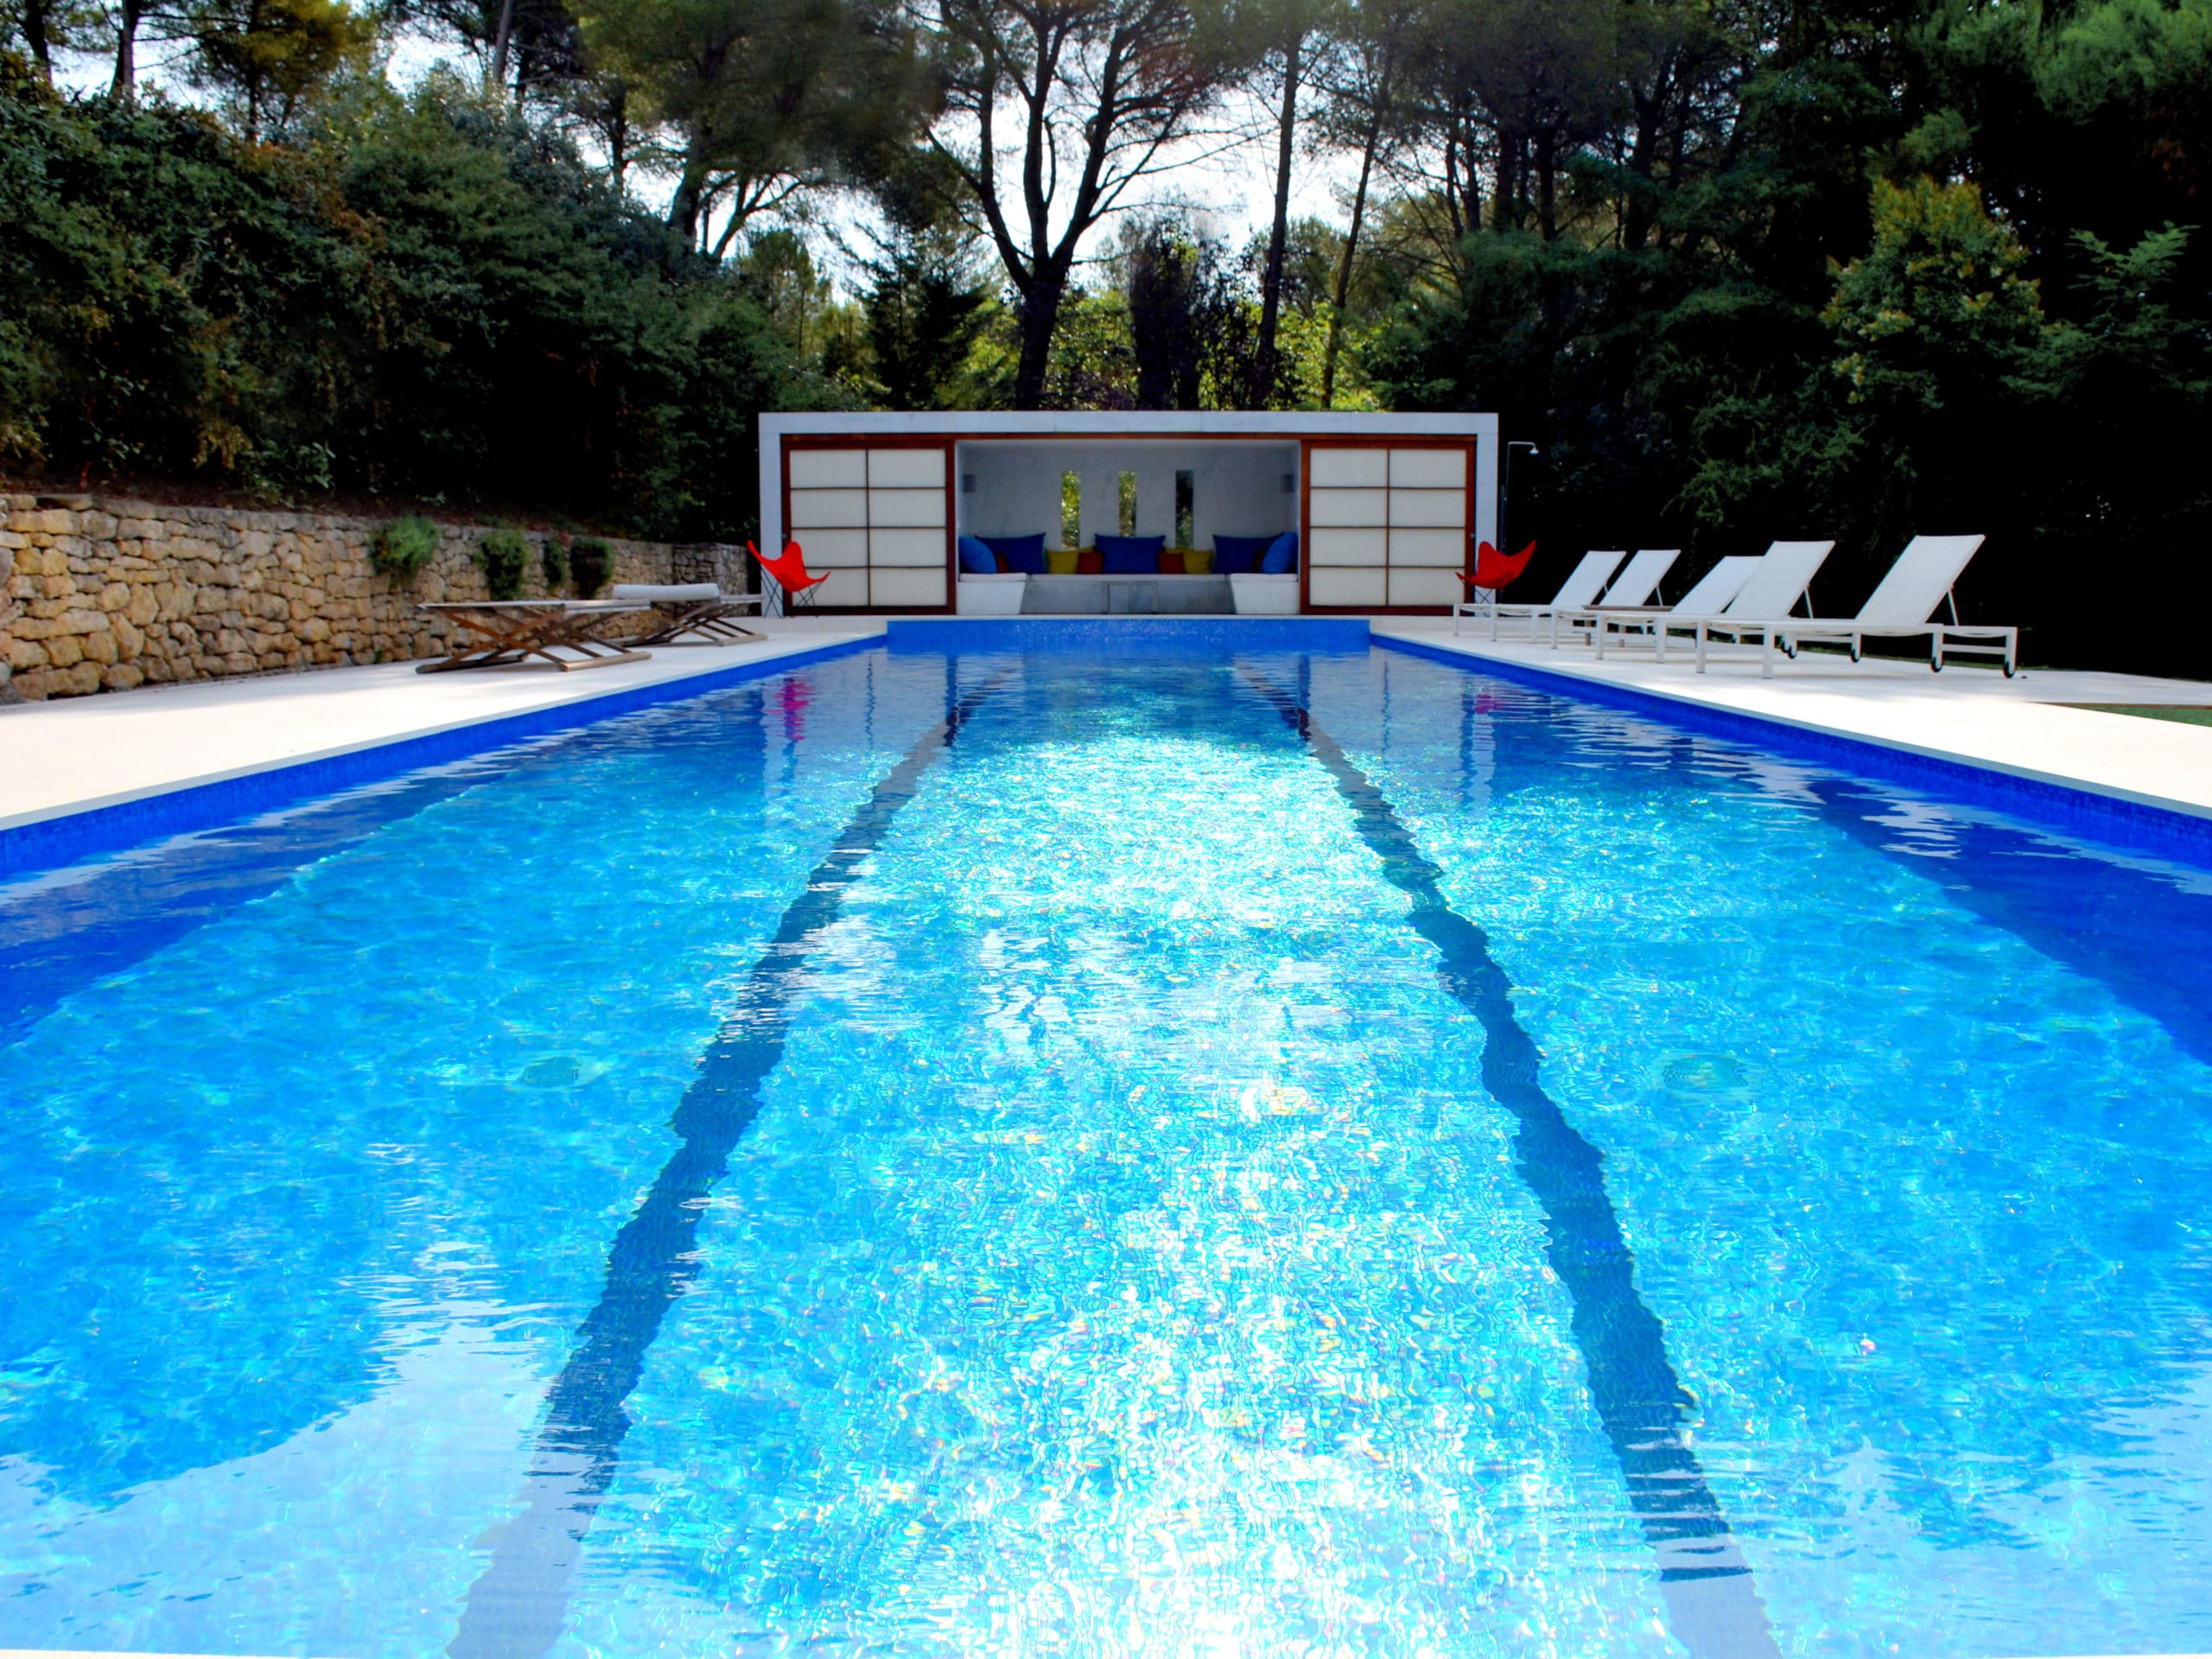 Nettoyage et entretien piscine